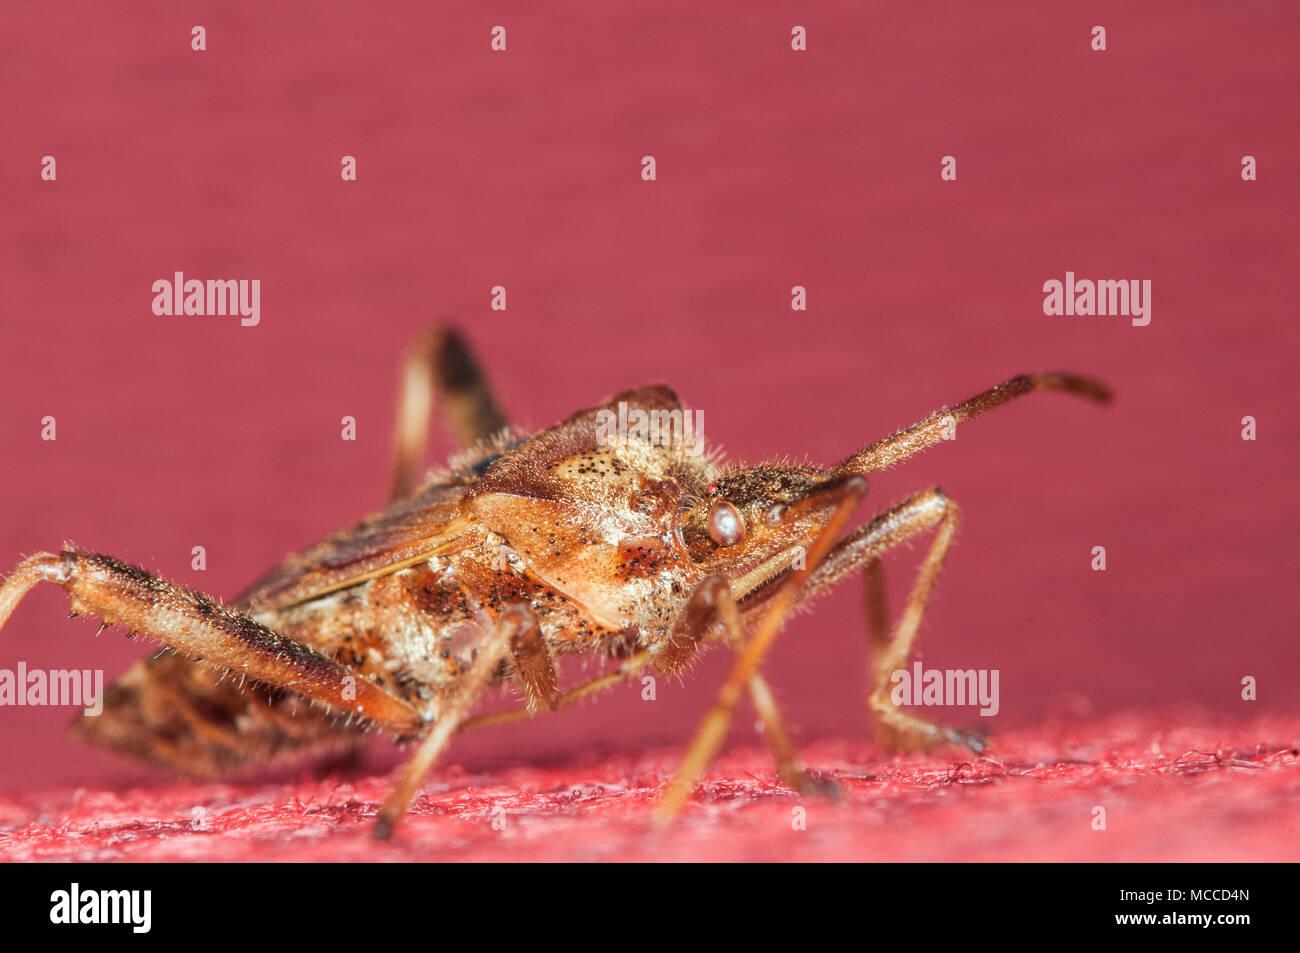 Vadnais Heights, Minnesota. Western conifer seed bug, Leptoglossus occidentalis. - Stock Image